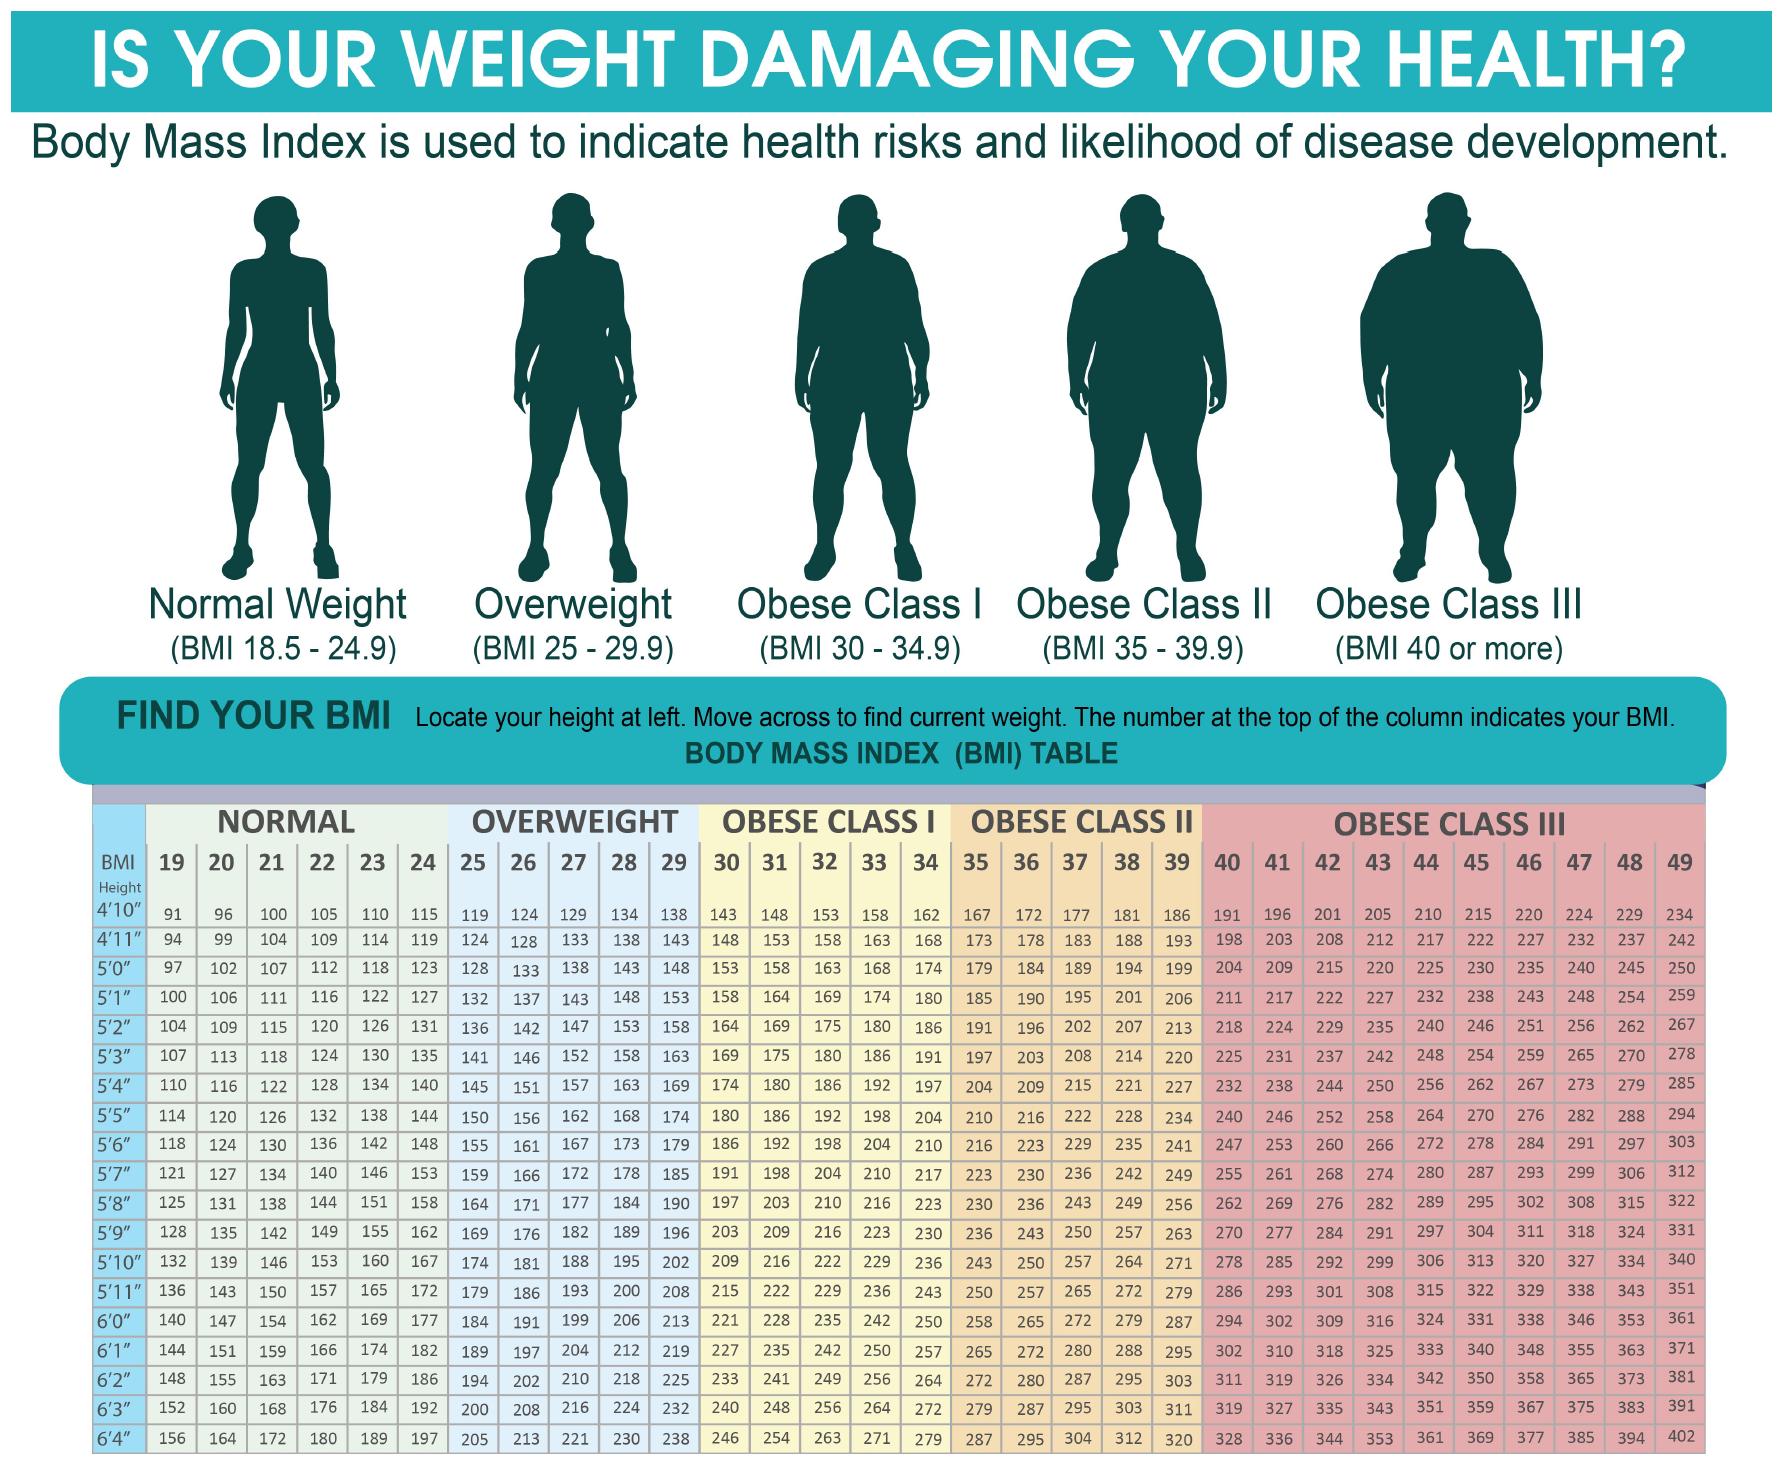 BMI Risk Chart Obesity Physician